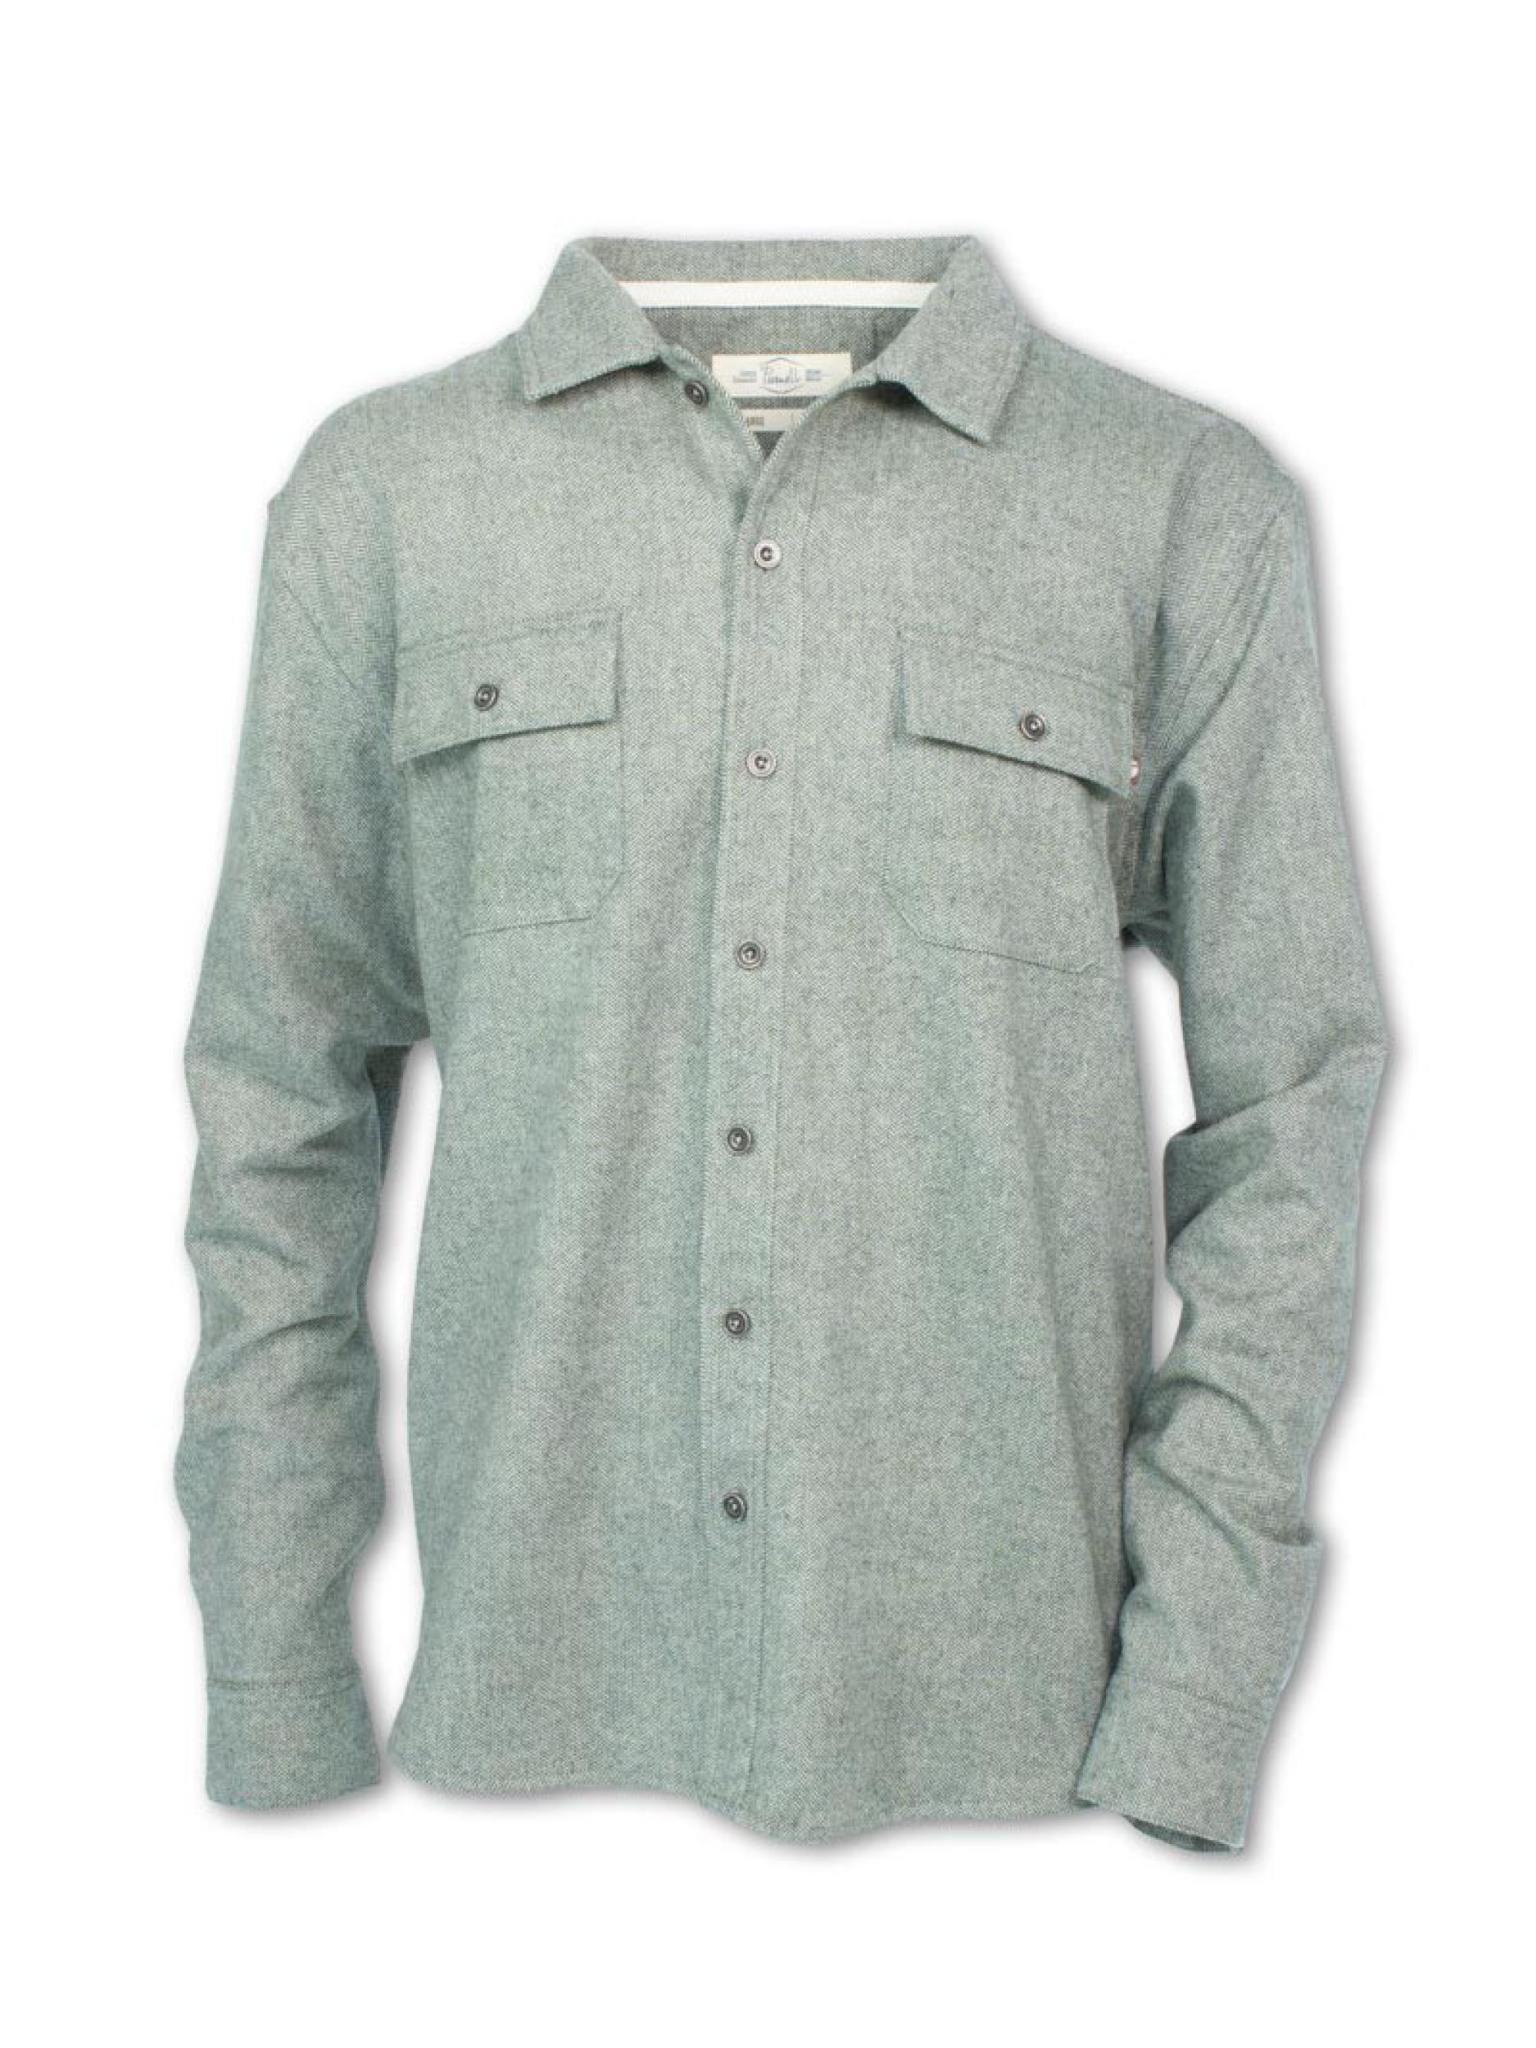 Purnell Men's Double Pocket Shirt